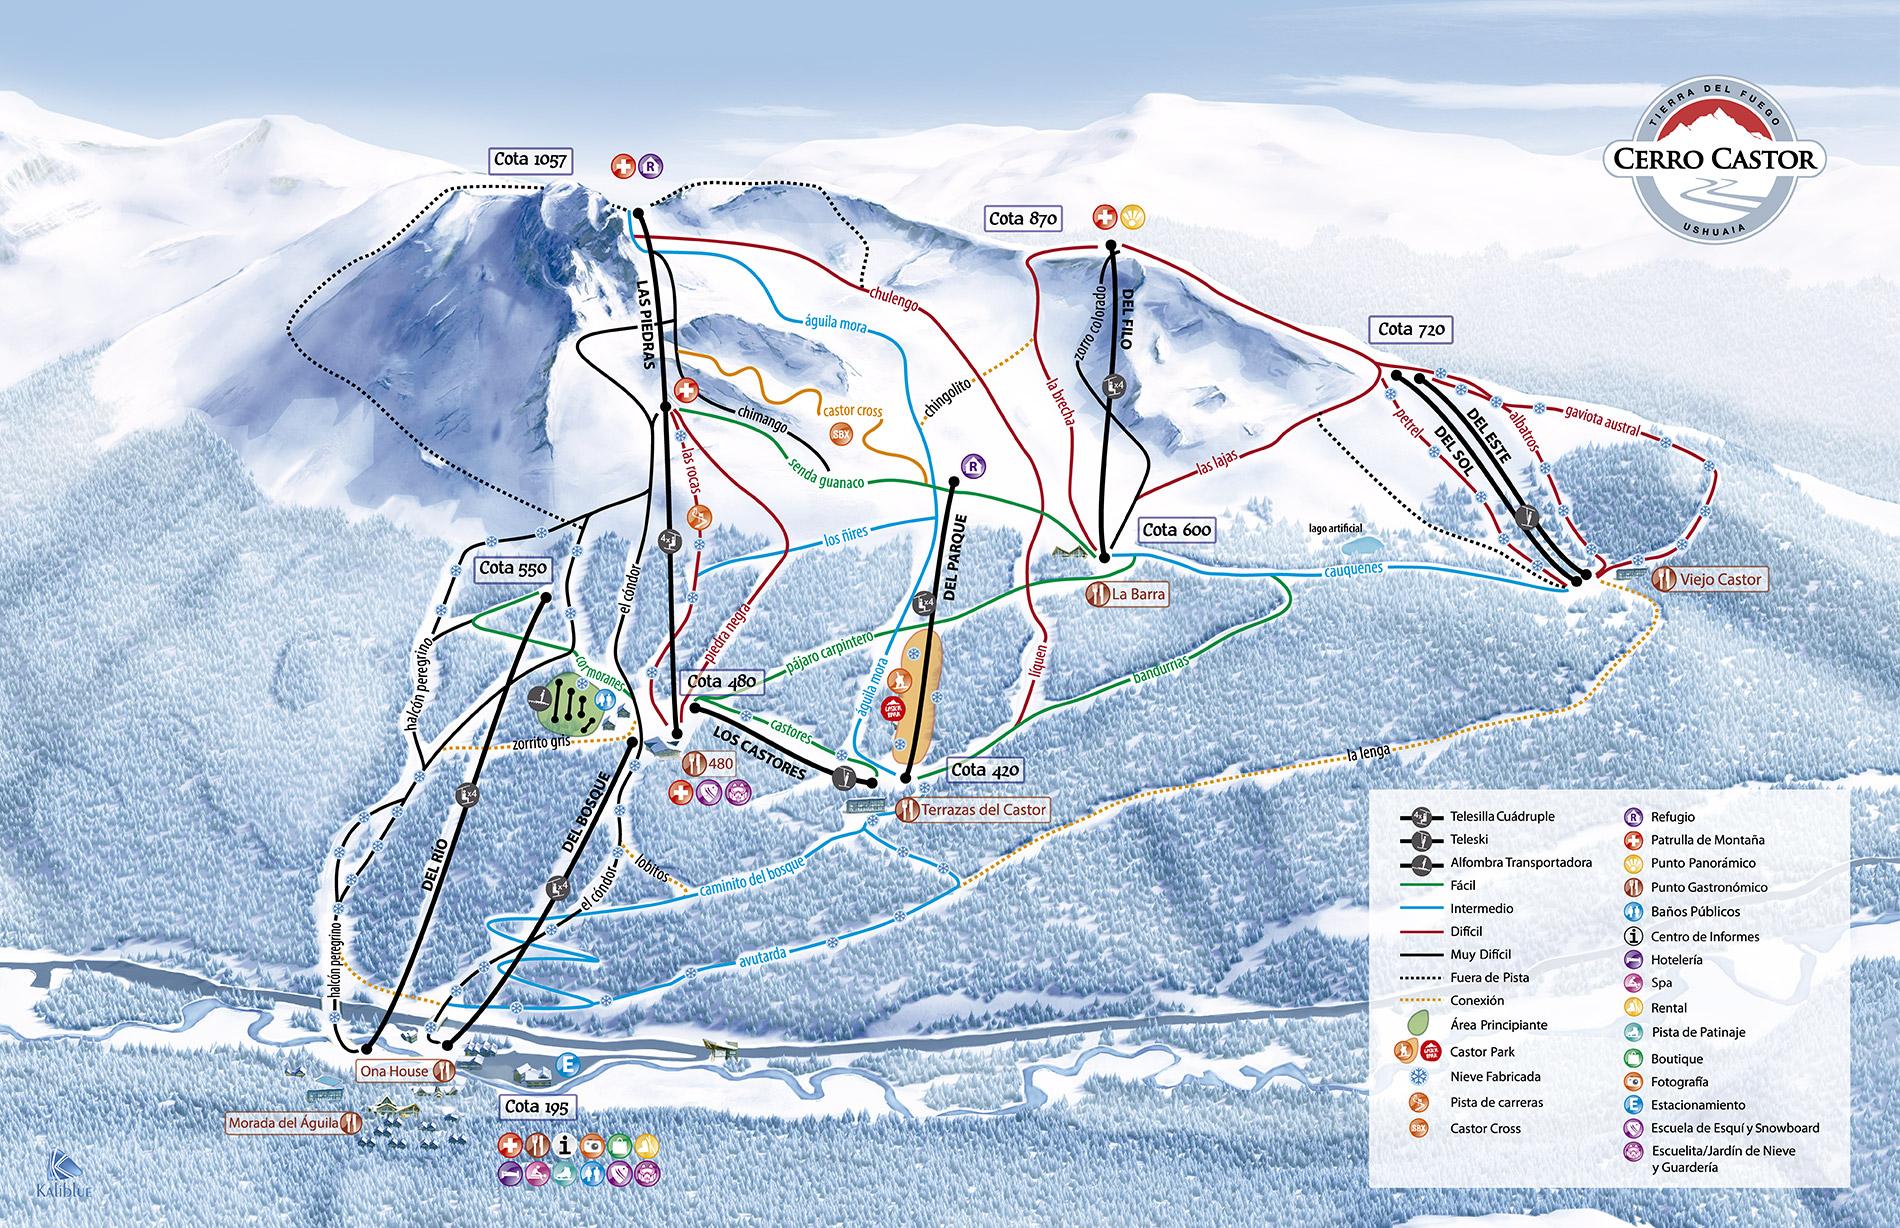 Cerro Castor Piste / Trail Map